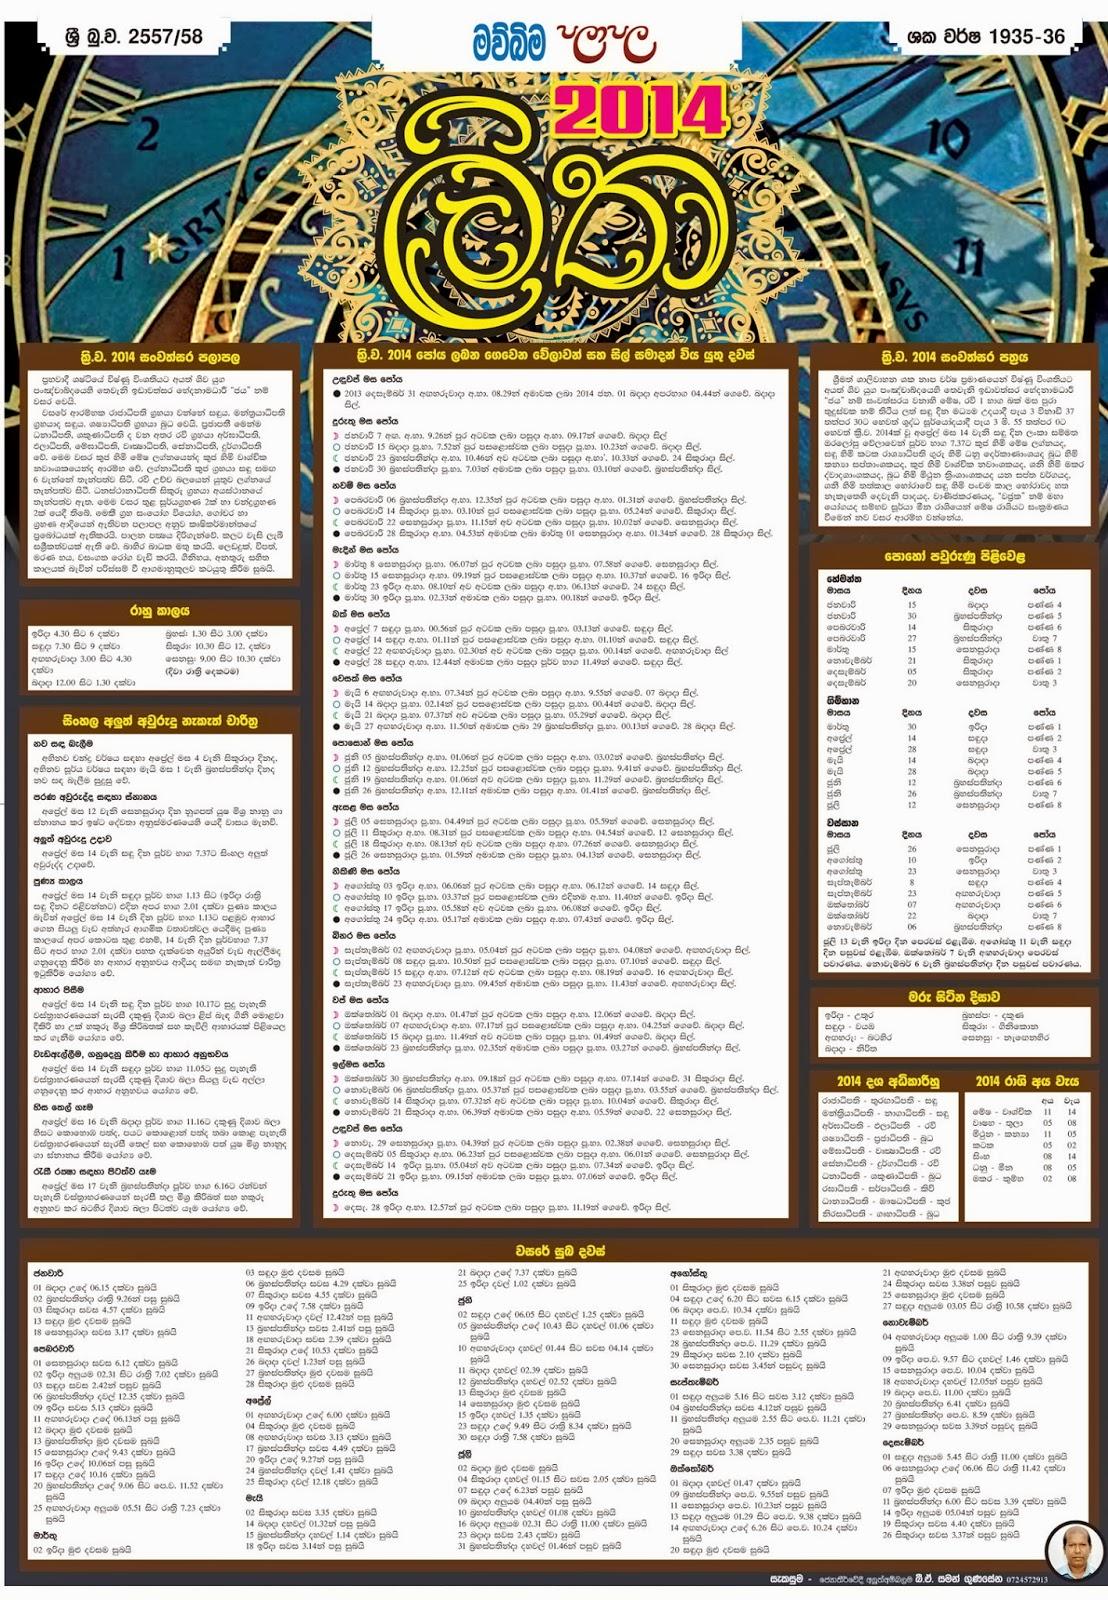 Apa Litha 2017 >> Sri Lanka Newspaper Articles: 2015 Palapala Litha - පලා පල ලිත